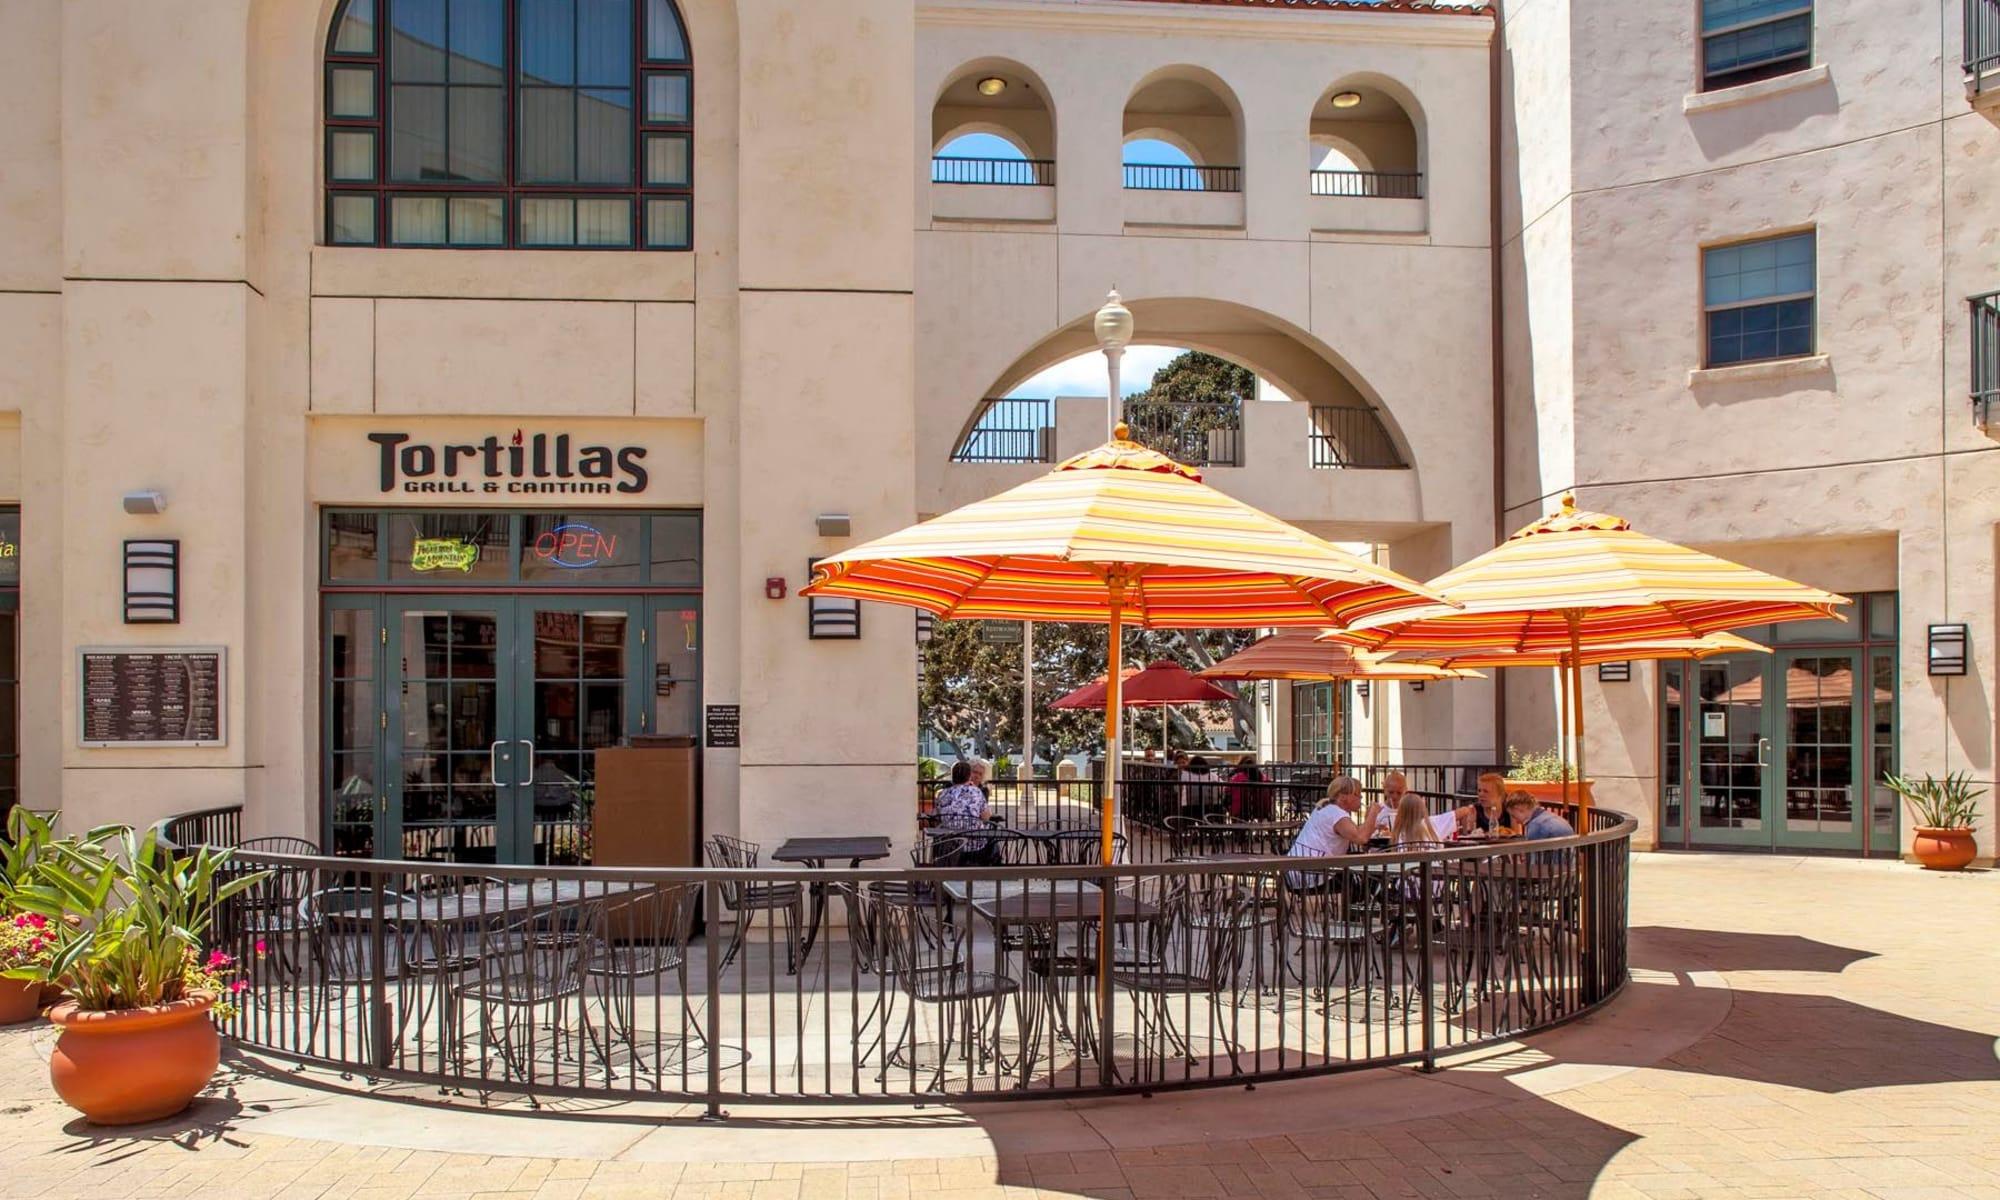 Courtyard with orange umbrellas at Mission Hills in Camarillo, California